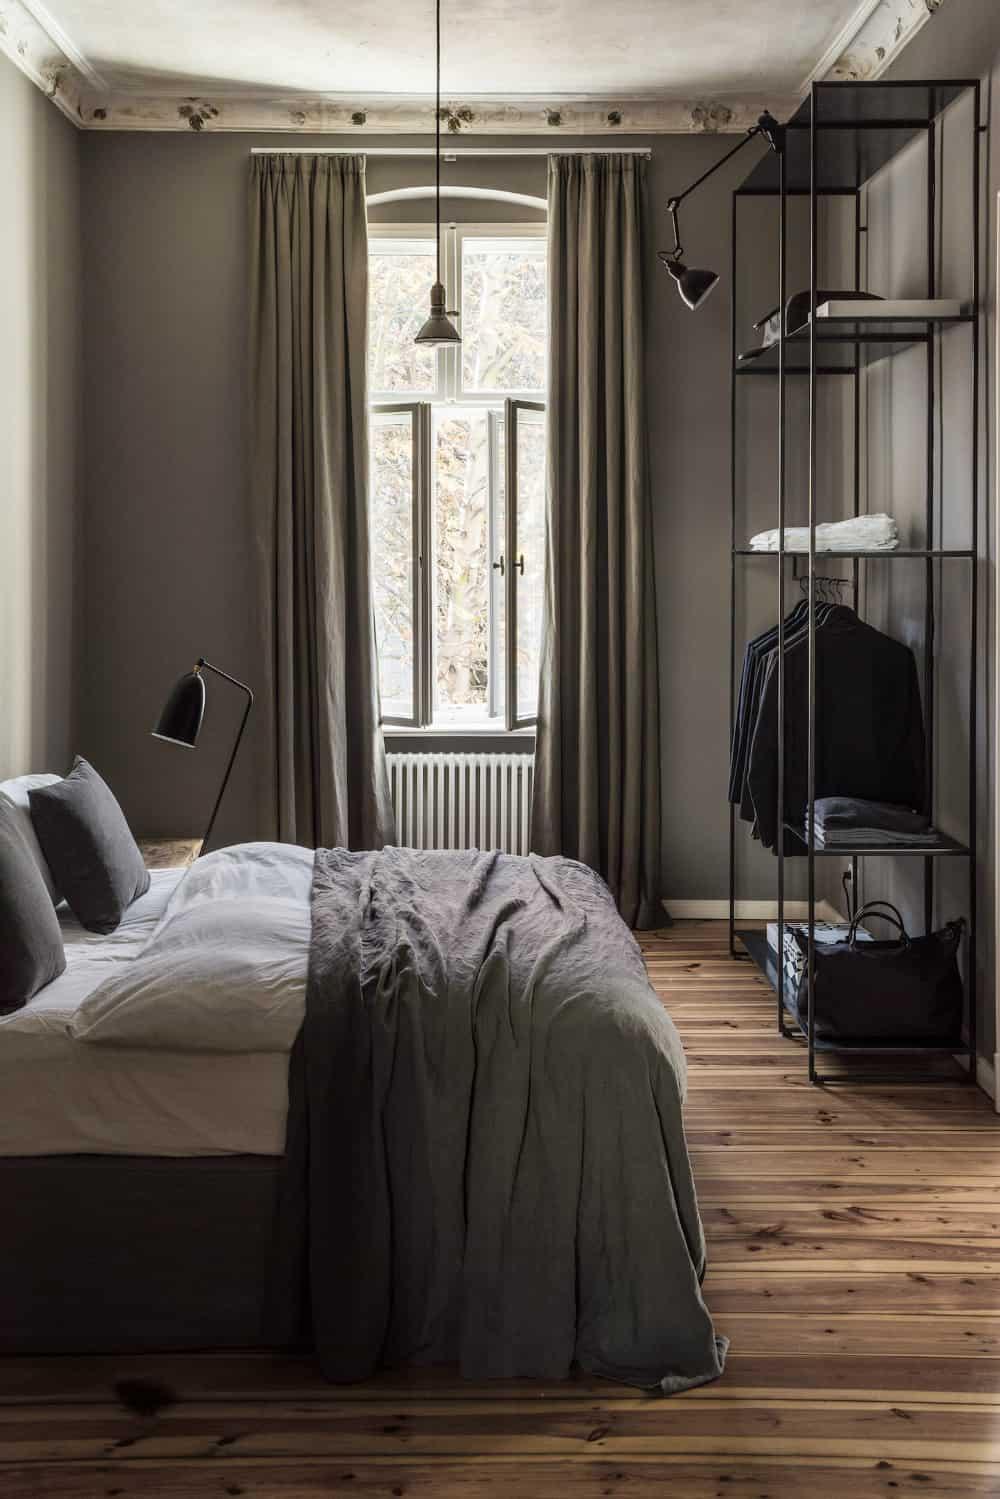 A Traveller's Home bedroom